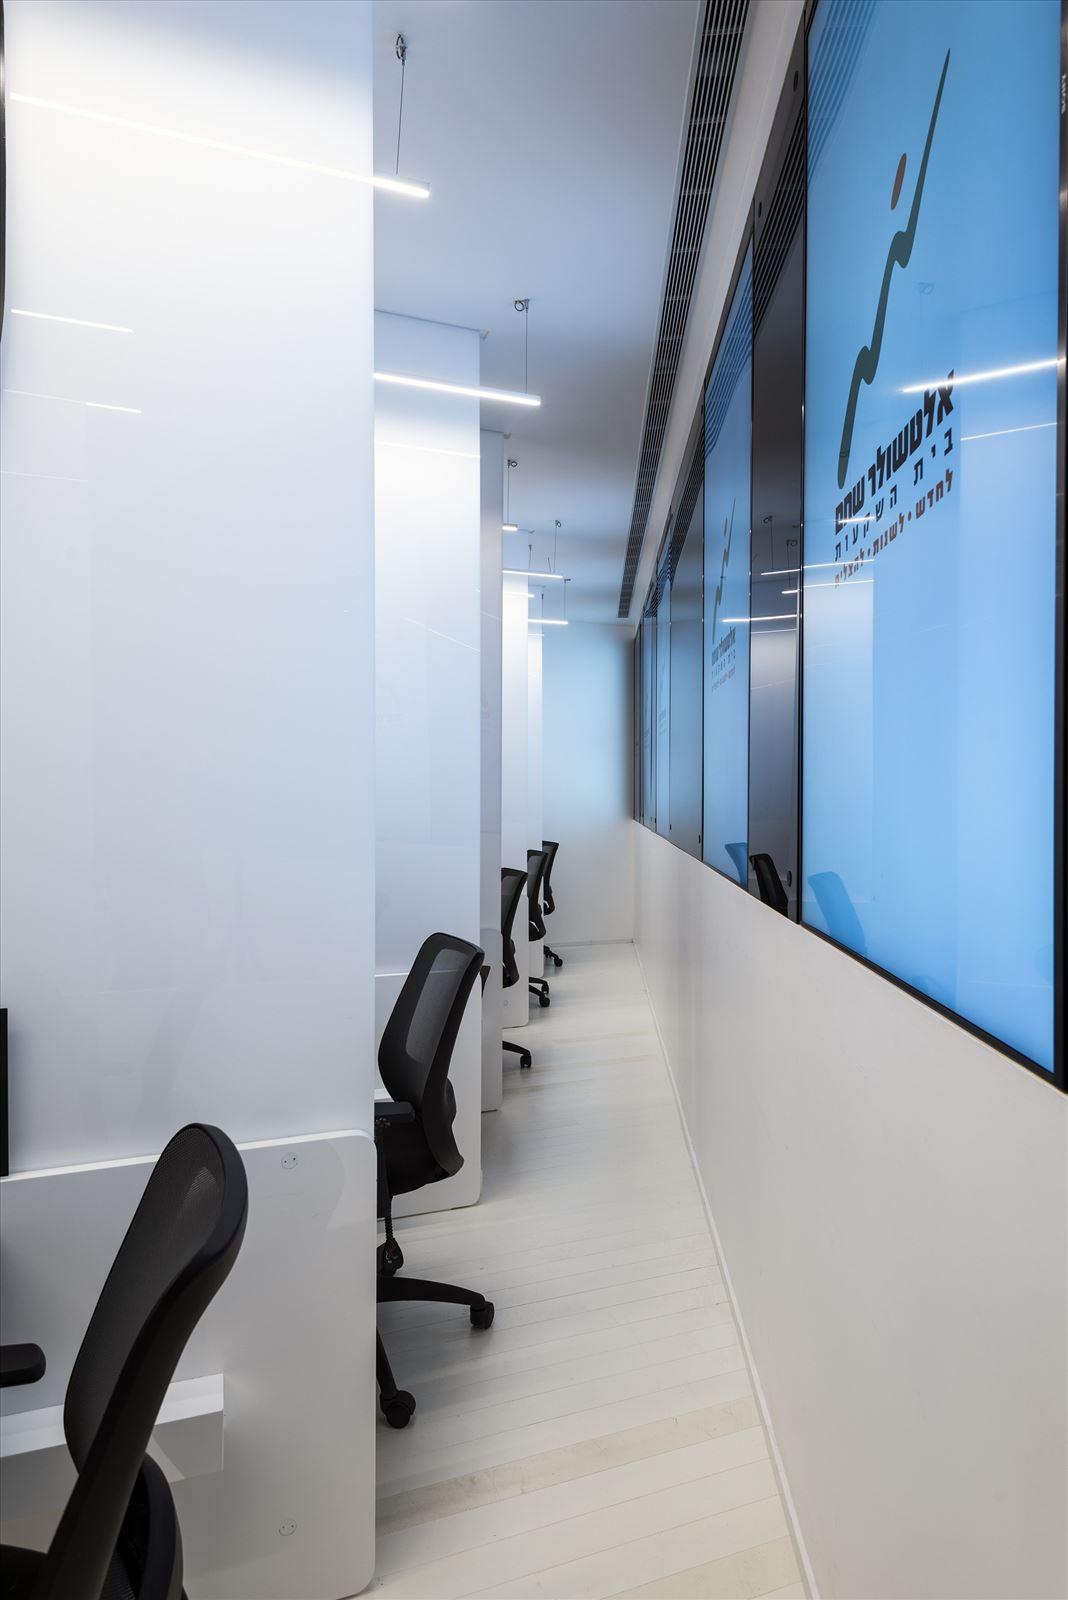 Office lighting project תאורה בעמדות העבודה על ידי קמחי תאורה